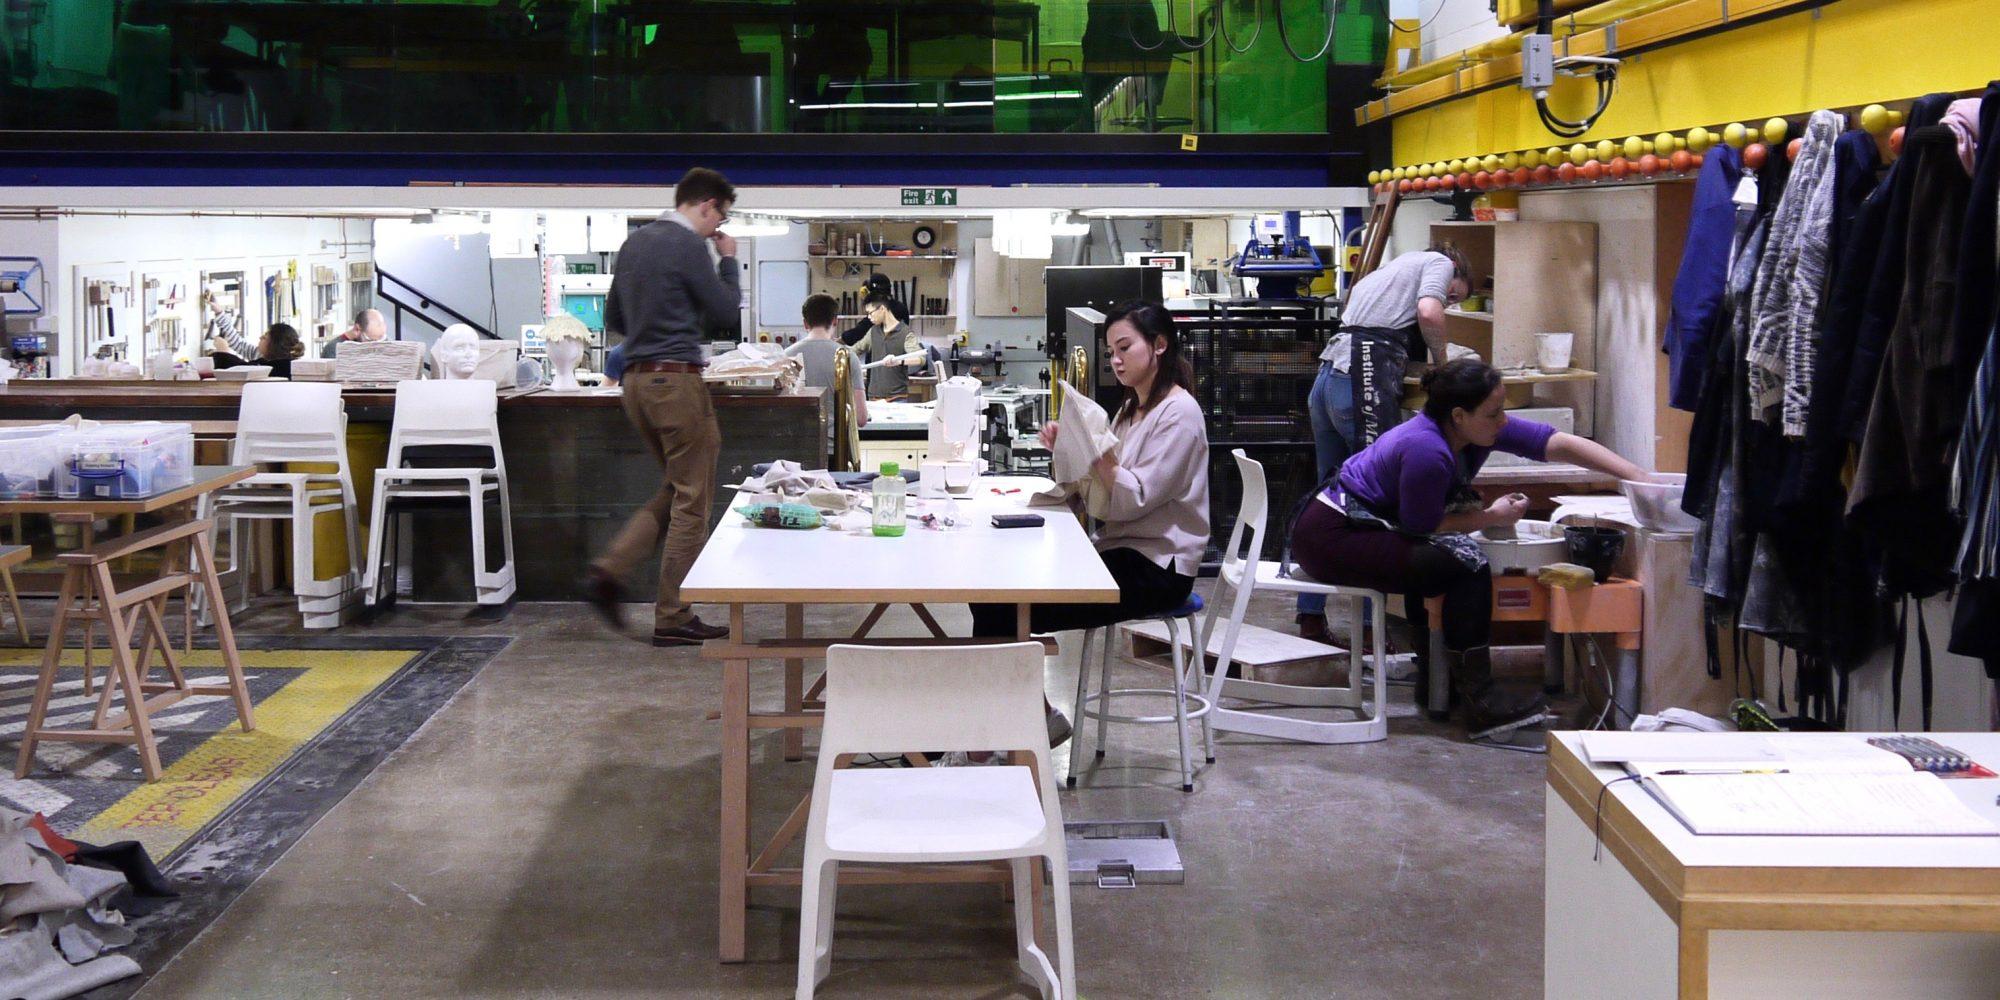 Spaces Rue De Londres in london, makers face gentrification : makery